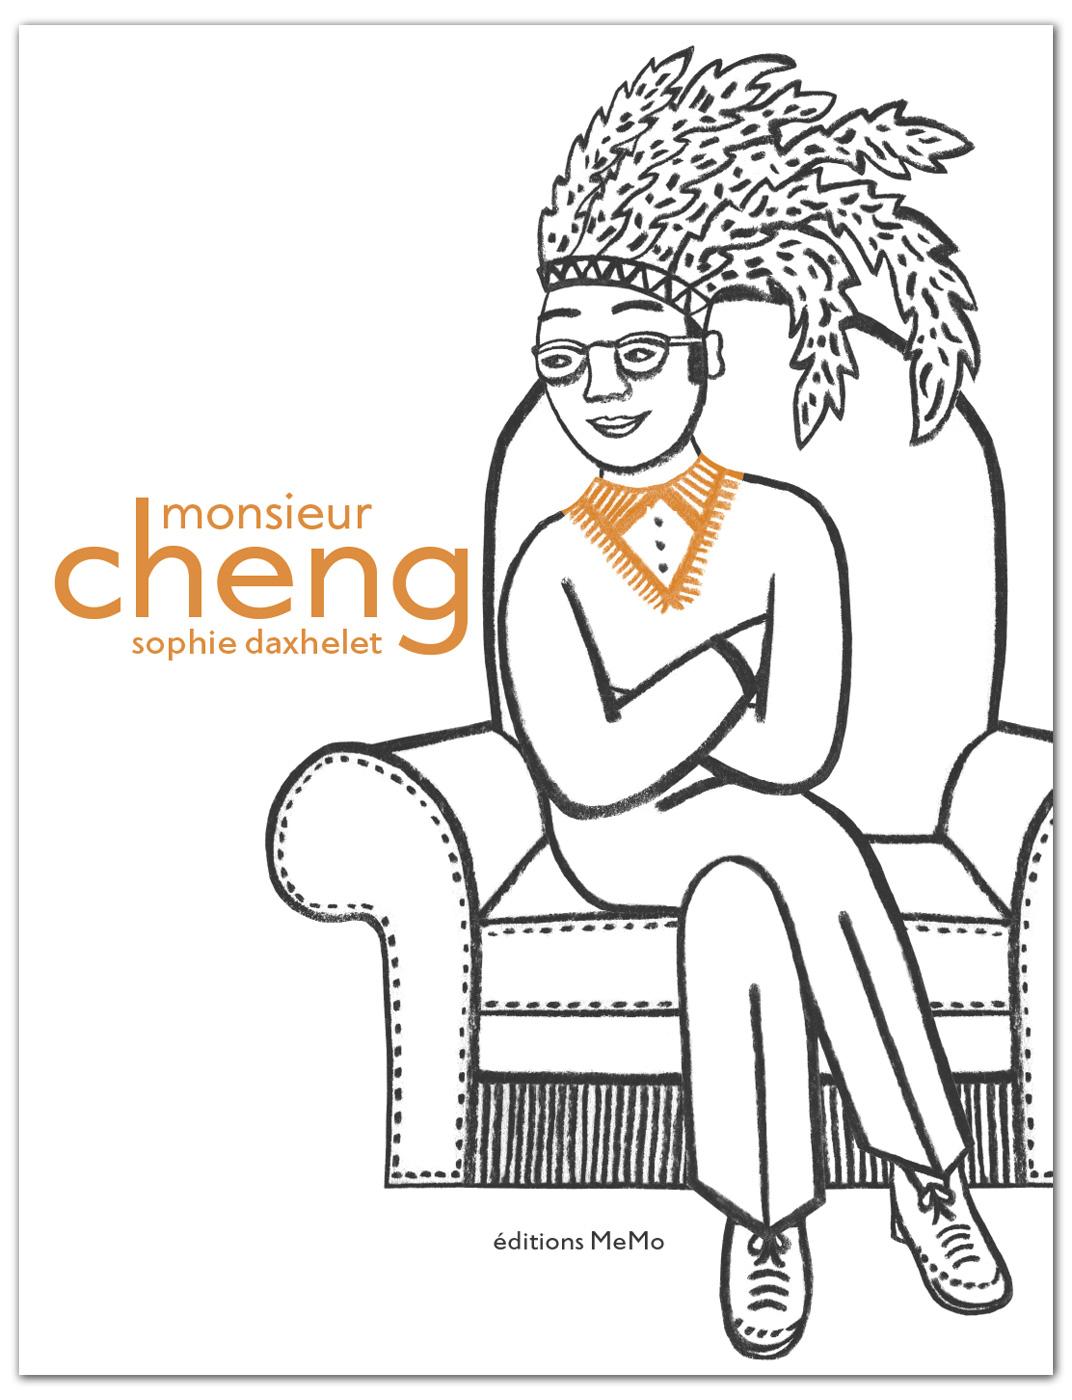 Monsieur Cheng